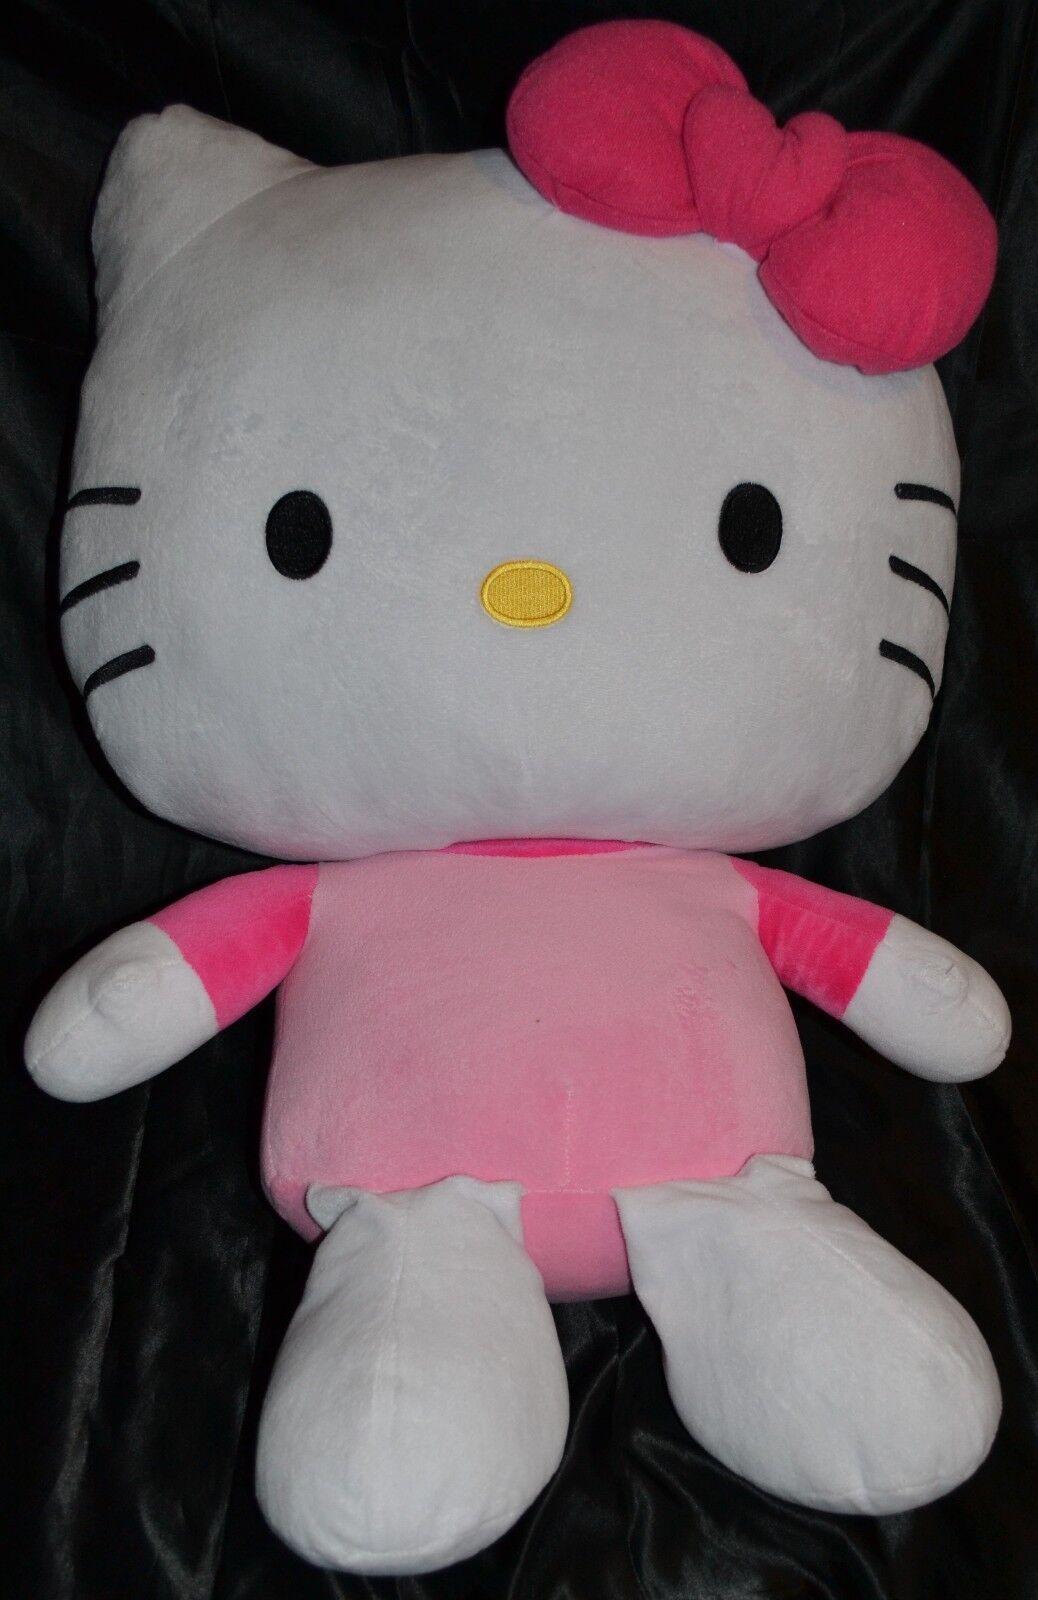 27.5  Jumbo Hello Kitty Muñecos Juguetes Animales De Peluche Peluche enorme Gran Tamaño Niño Grande